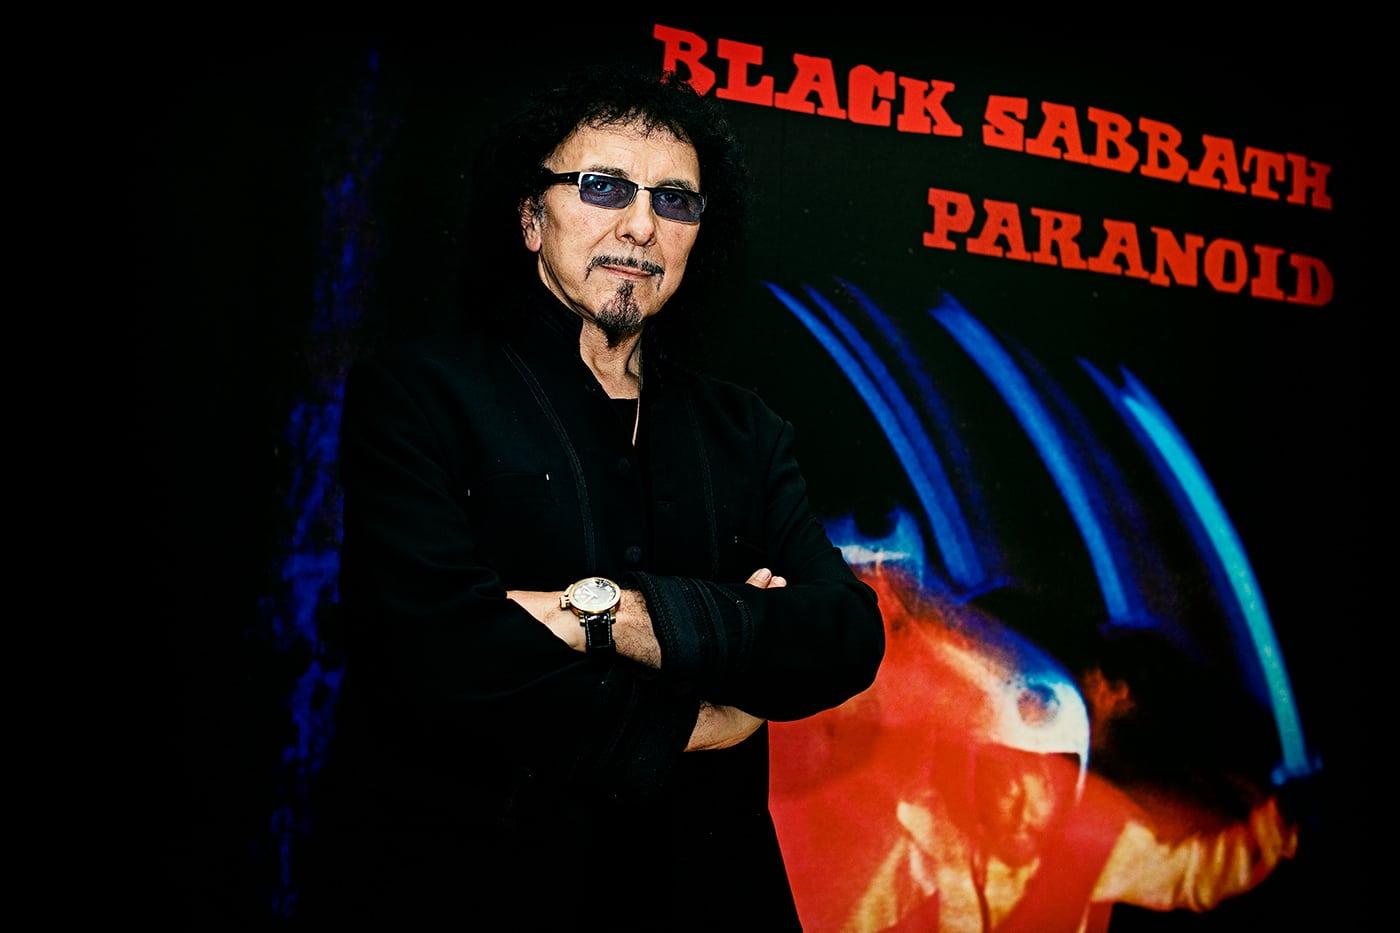 Black Sabbath Tony